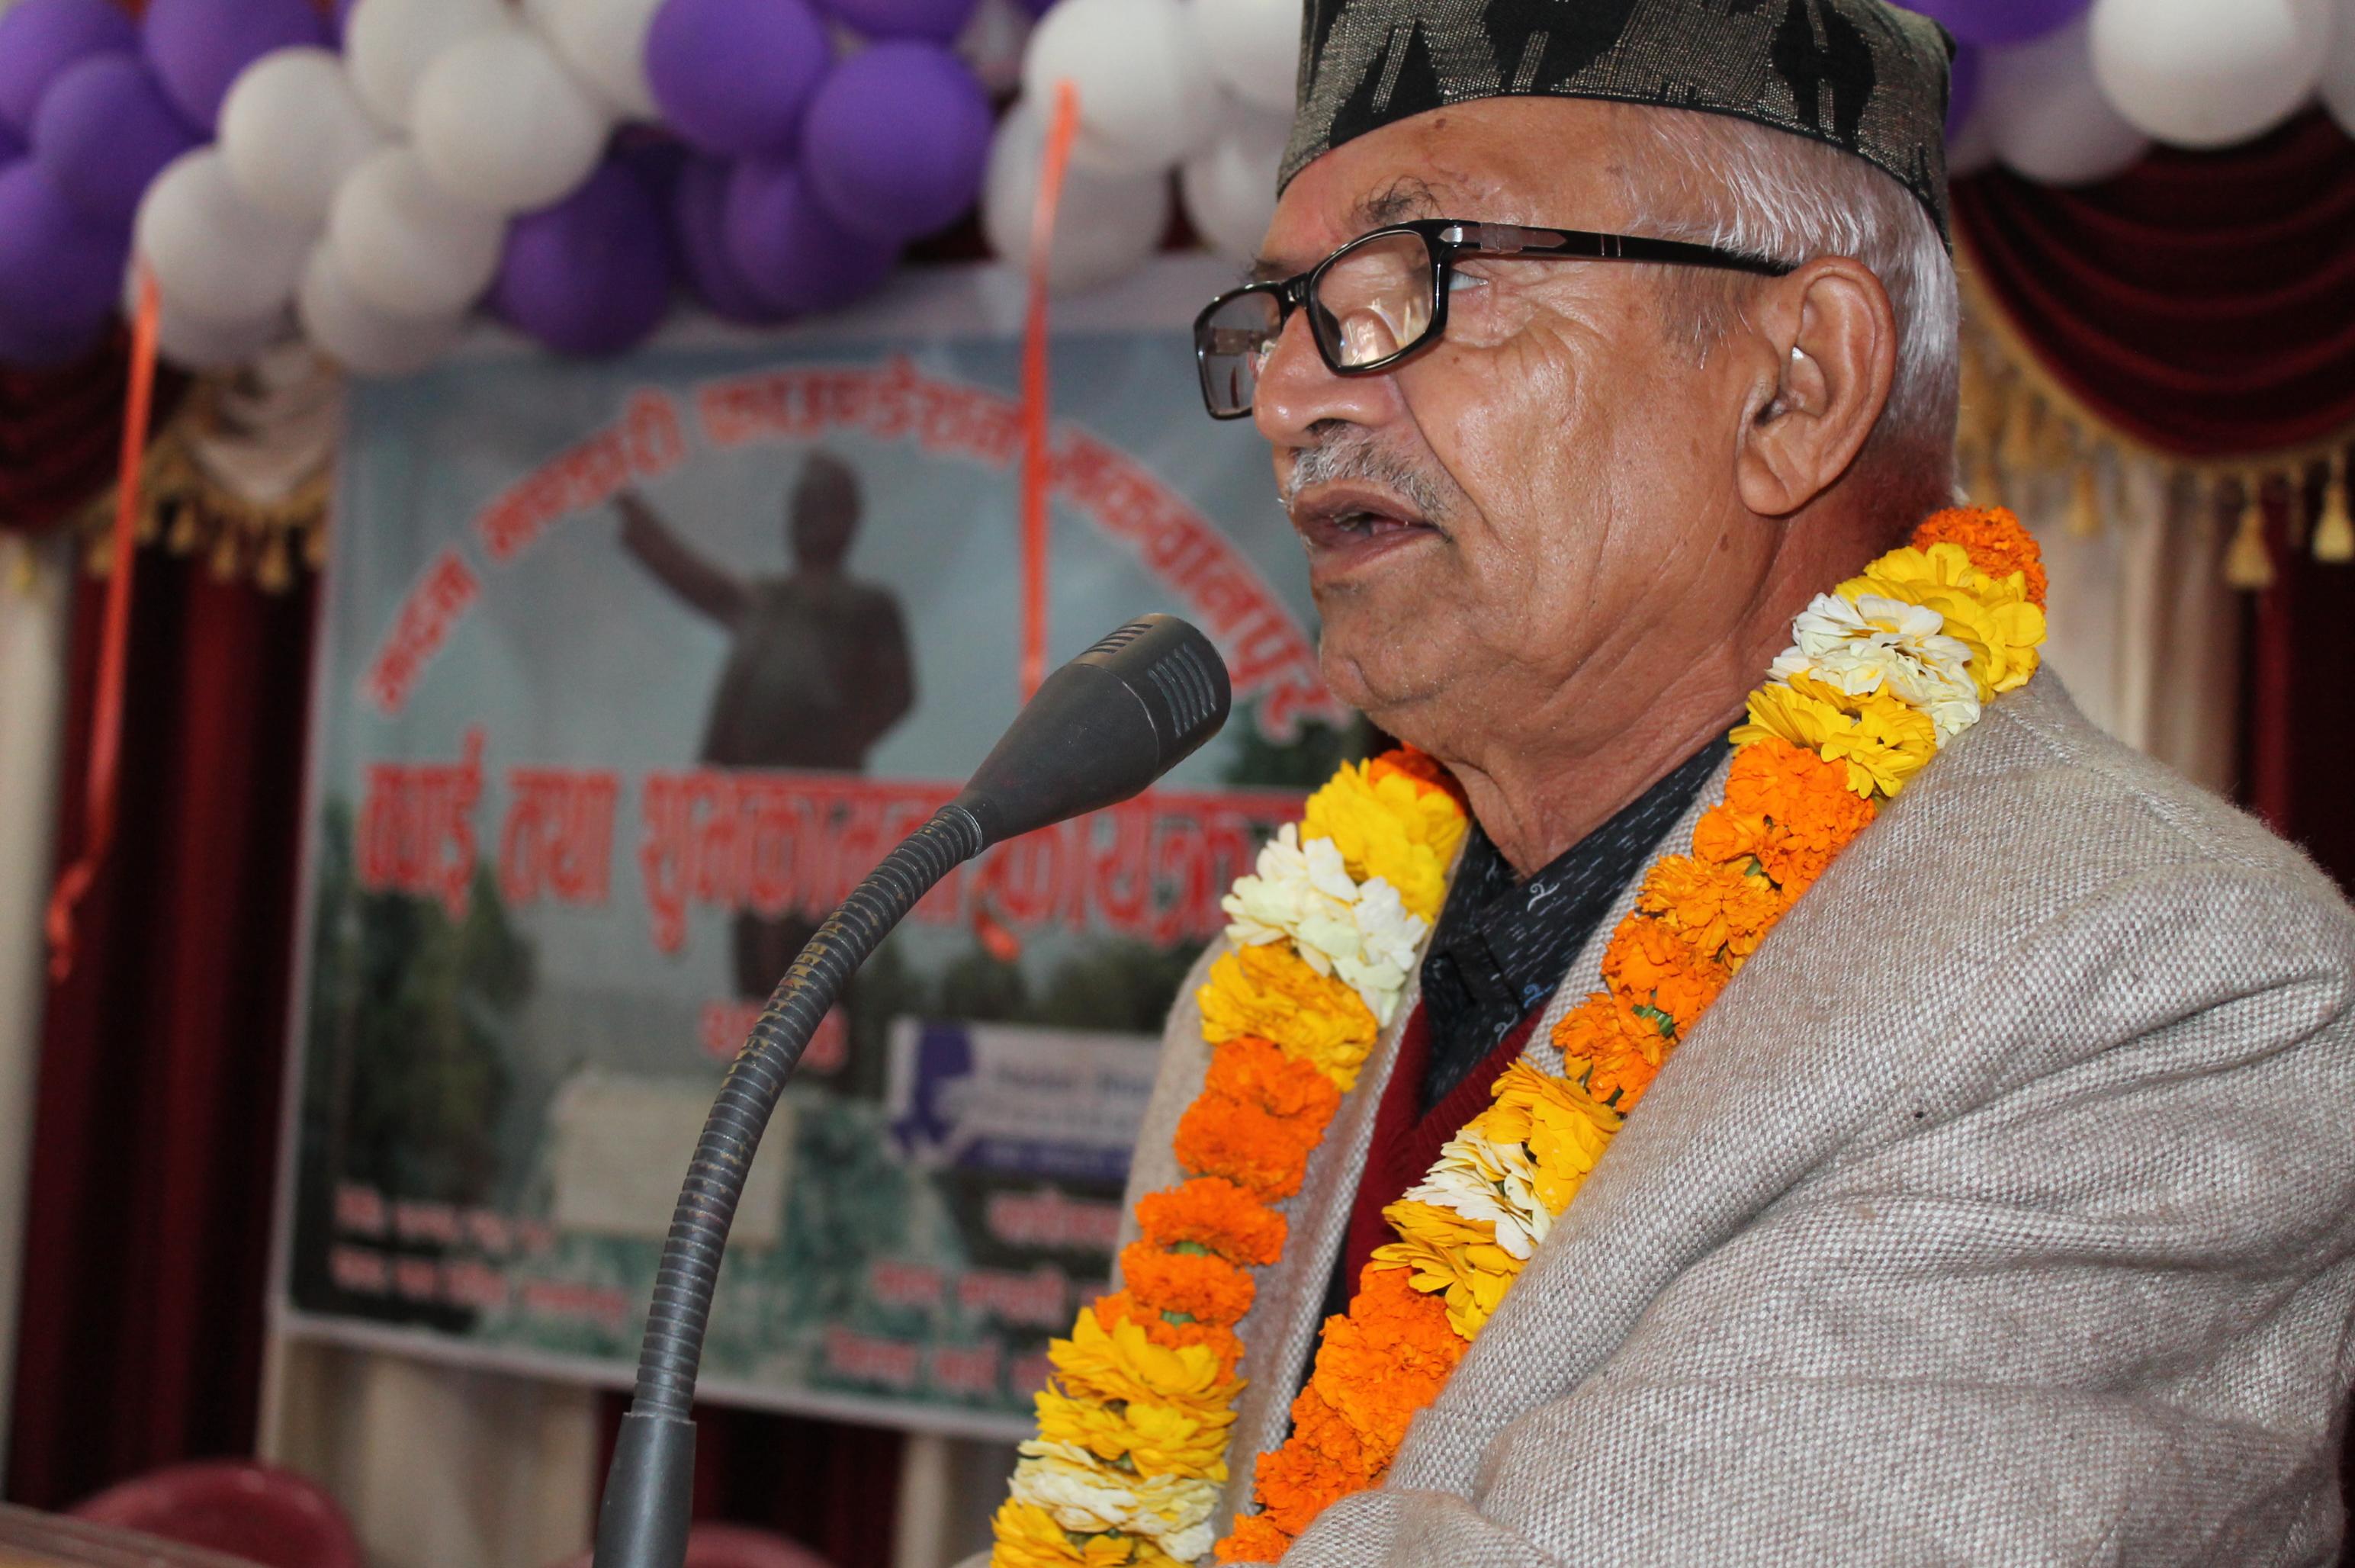 Chief Minister Dor Mani Poudel speaking at an award ceremony organised by Madan Bhandari Foundation, Hetauda. PHOTO: Prakash Dahal